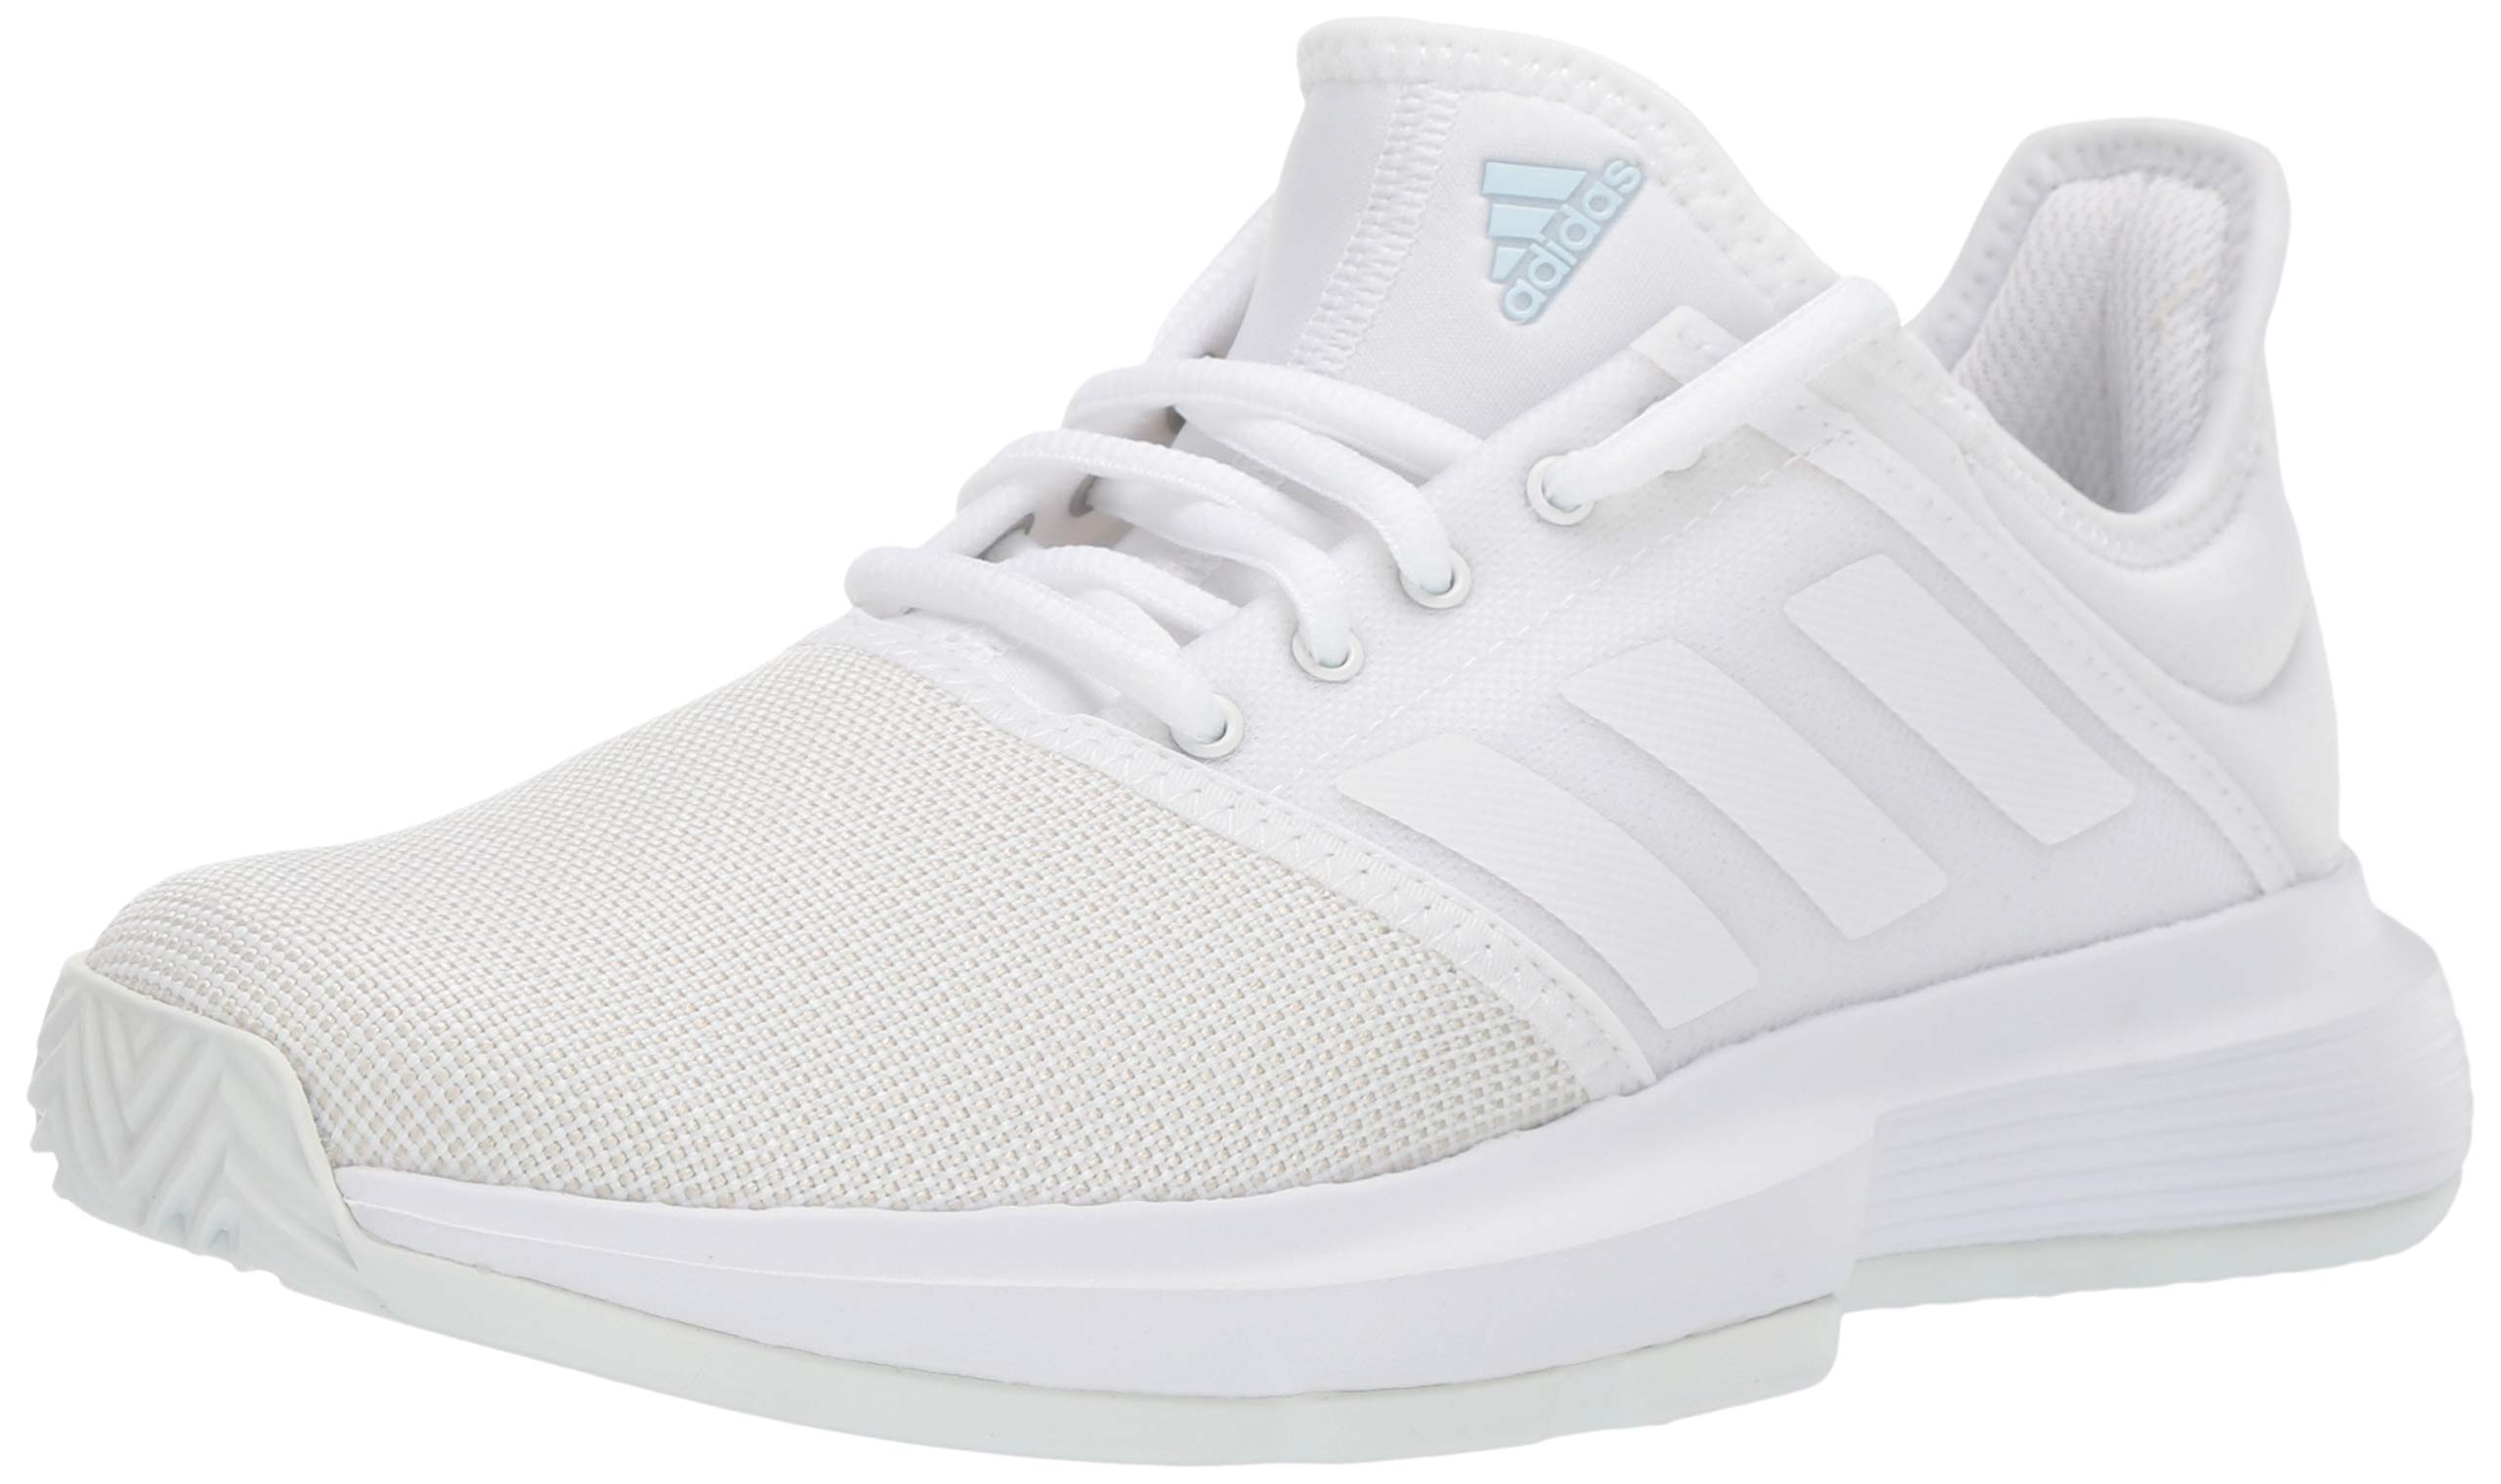 adidas Women's GameCourt Tennis Shoe, White/Blue Tint, 7 M US